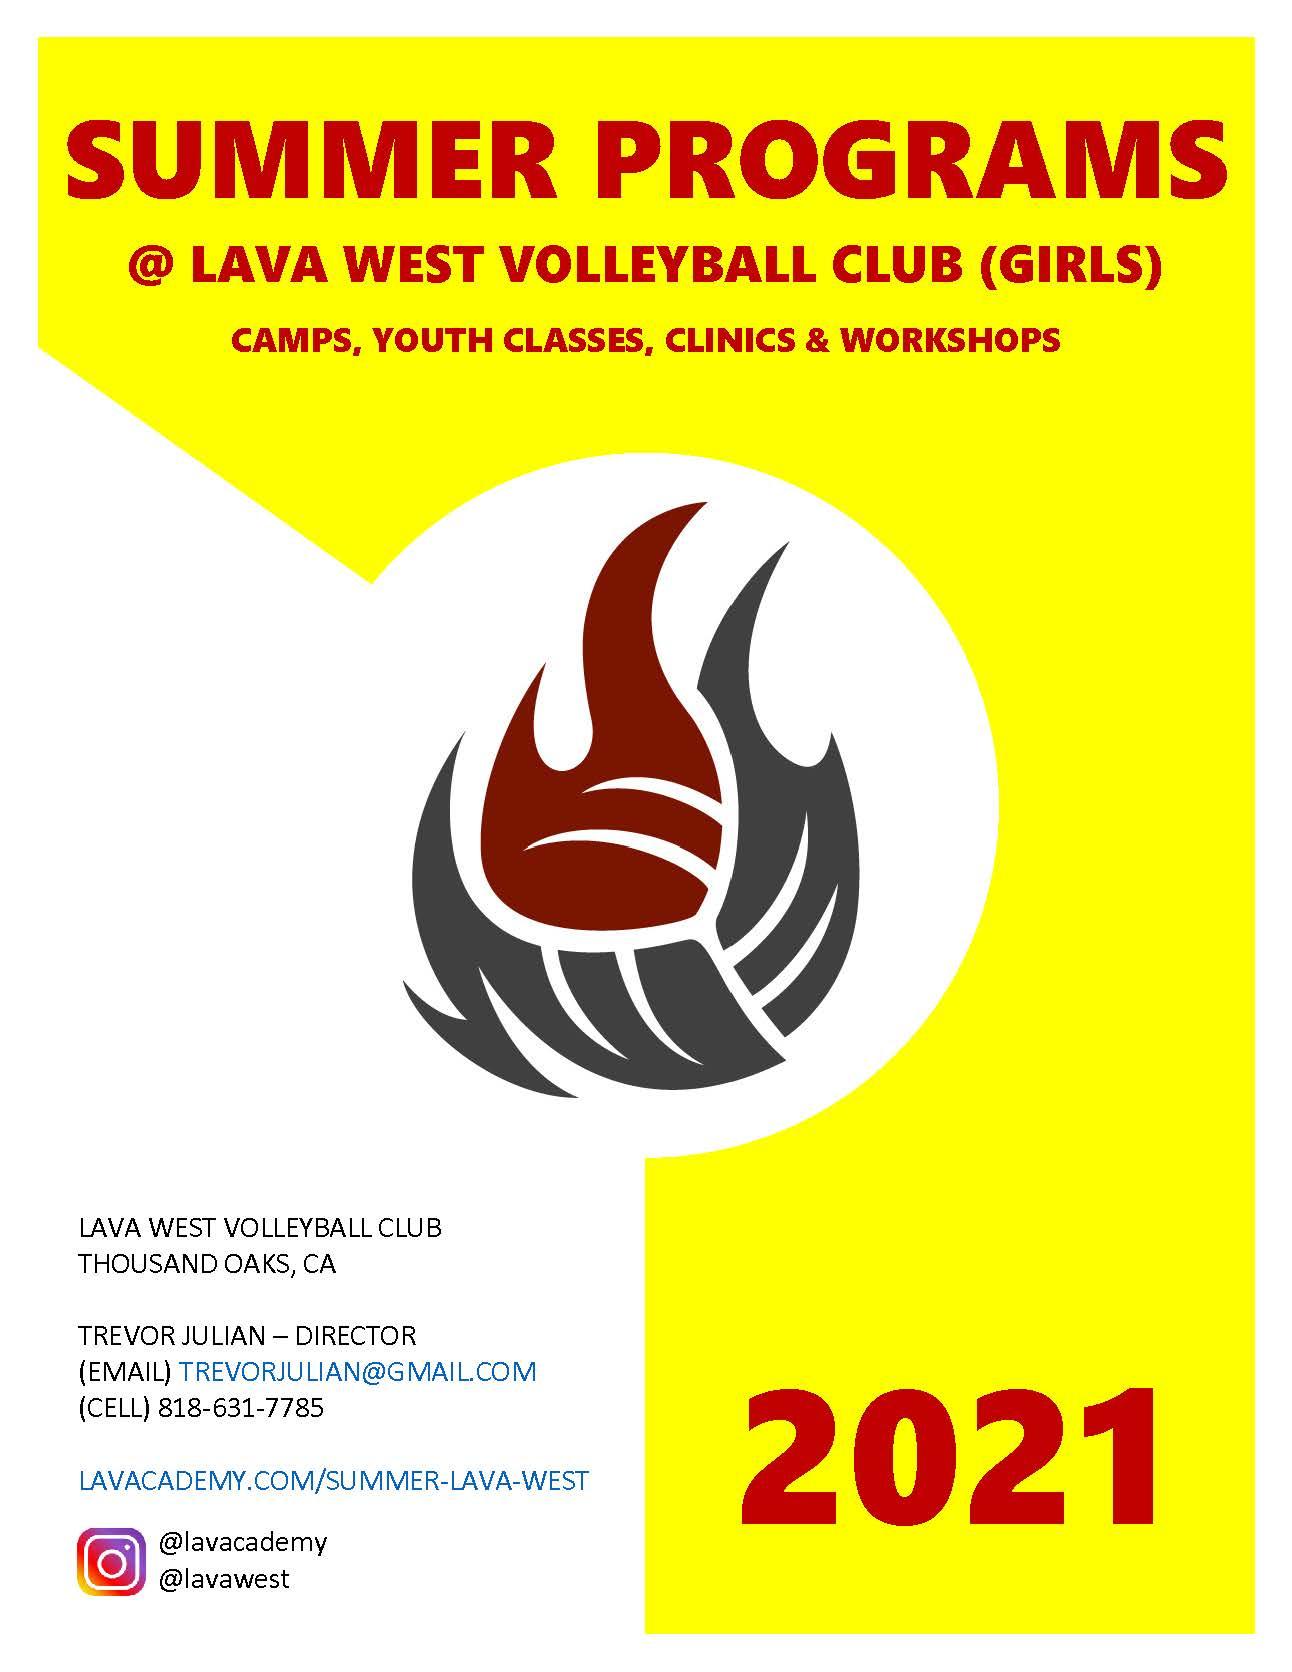 Program Guide - Summer 2021 - Lava West - 00 cover